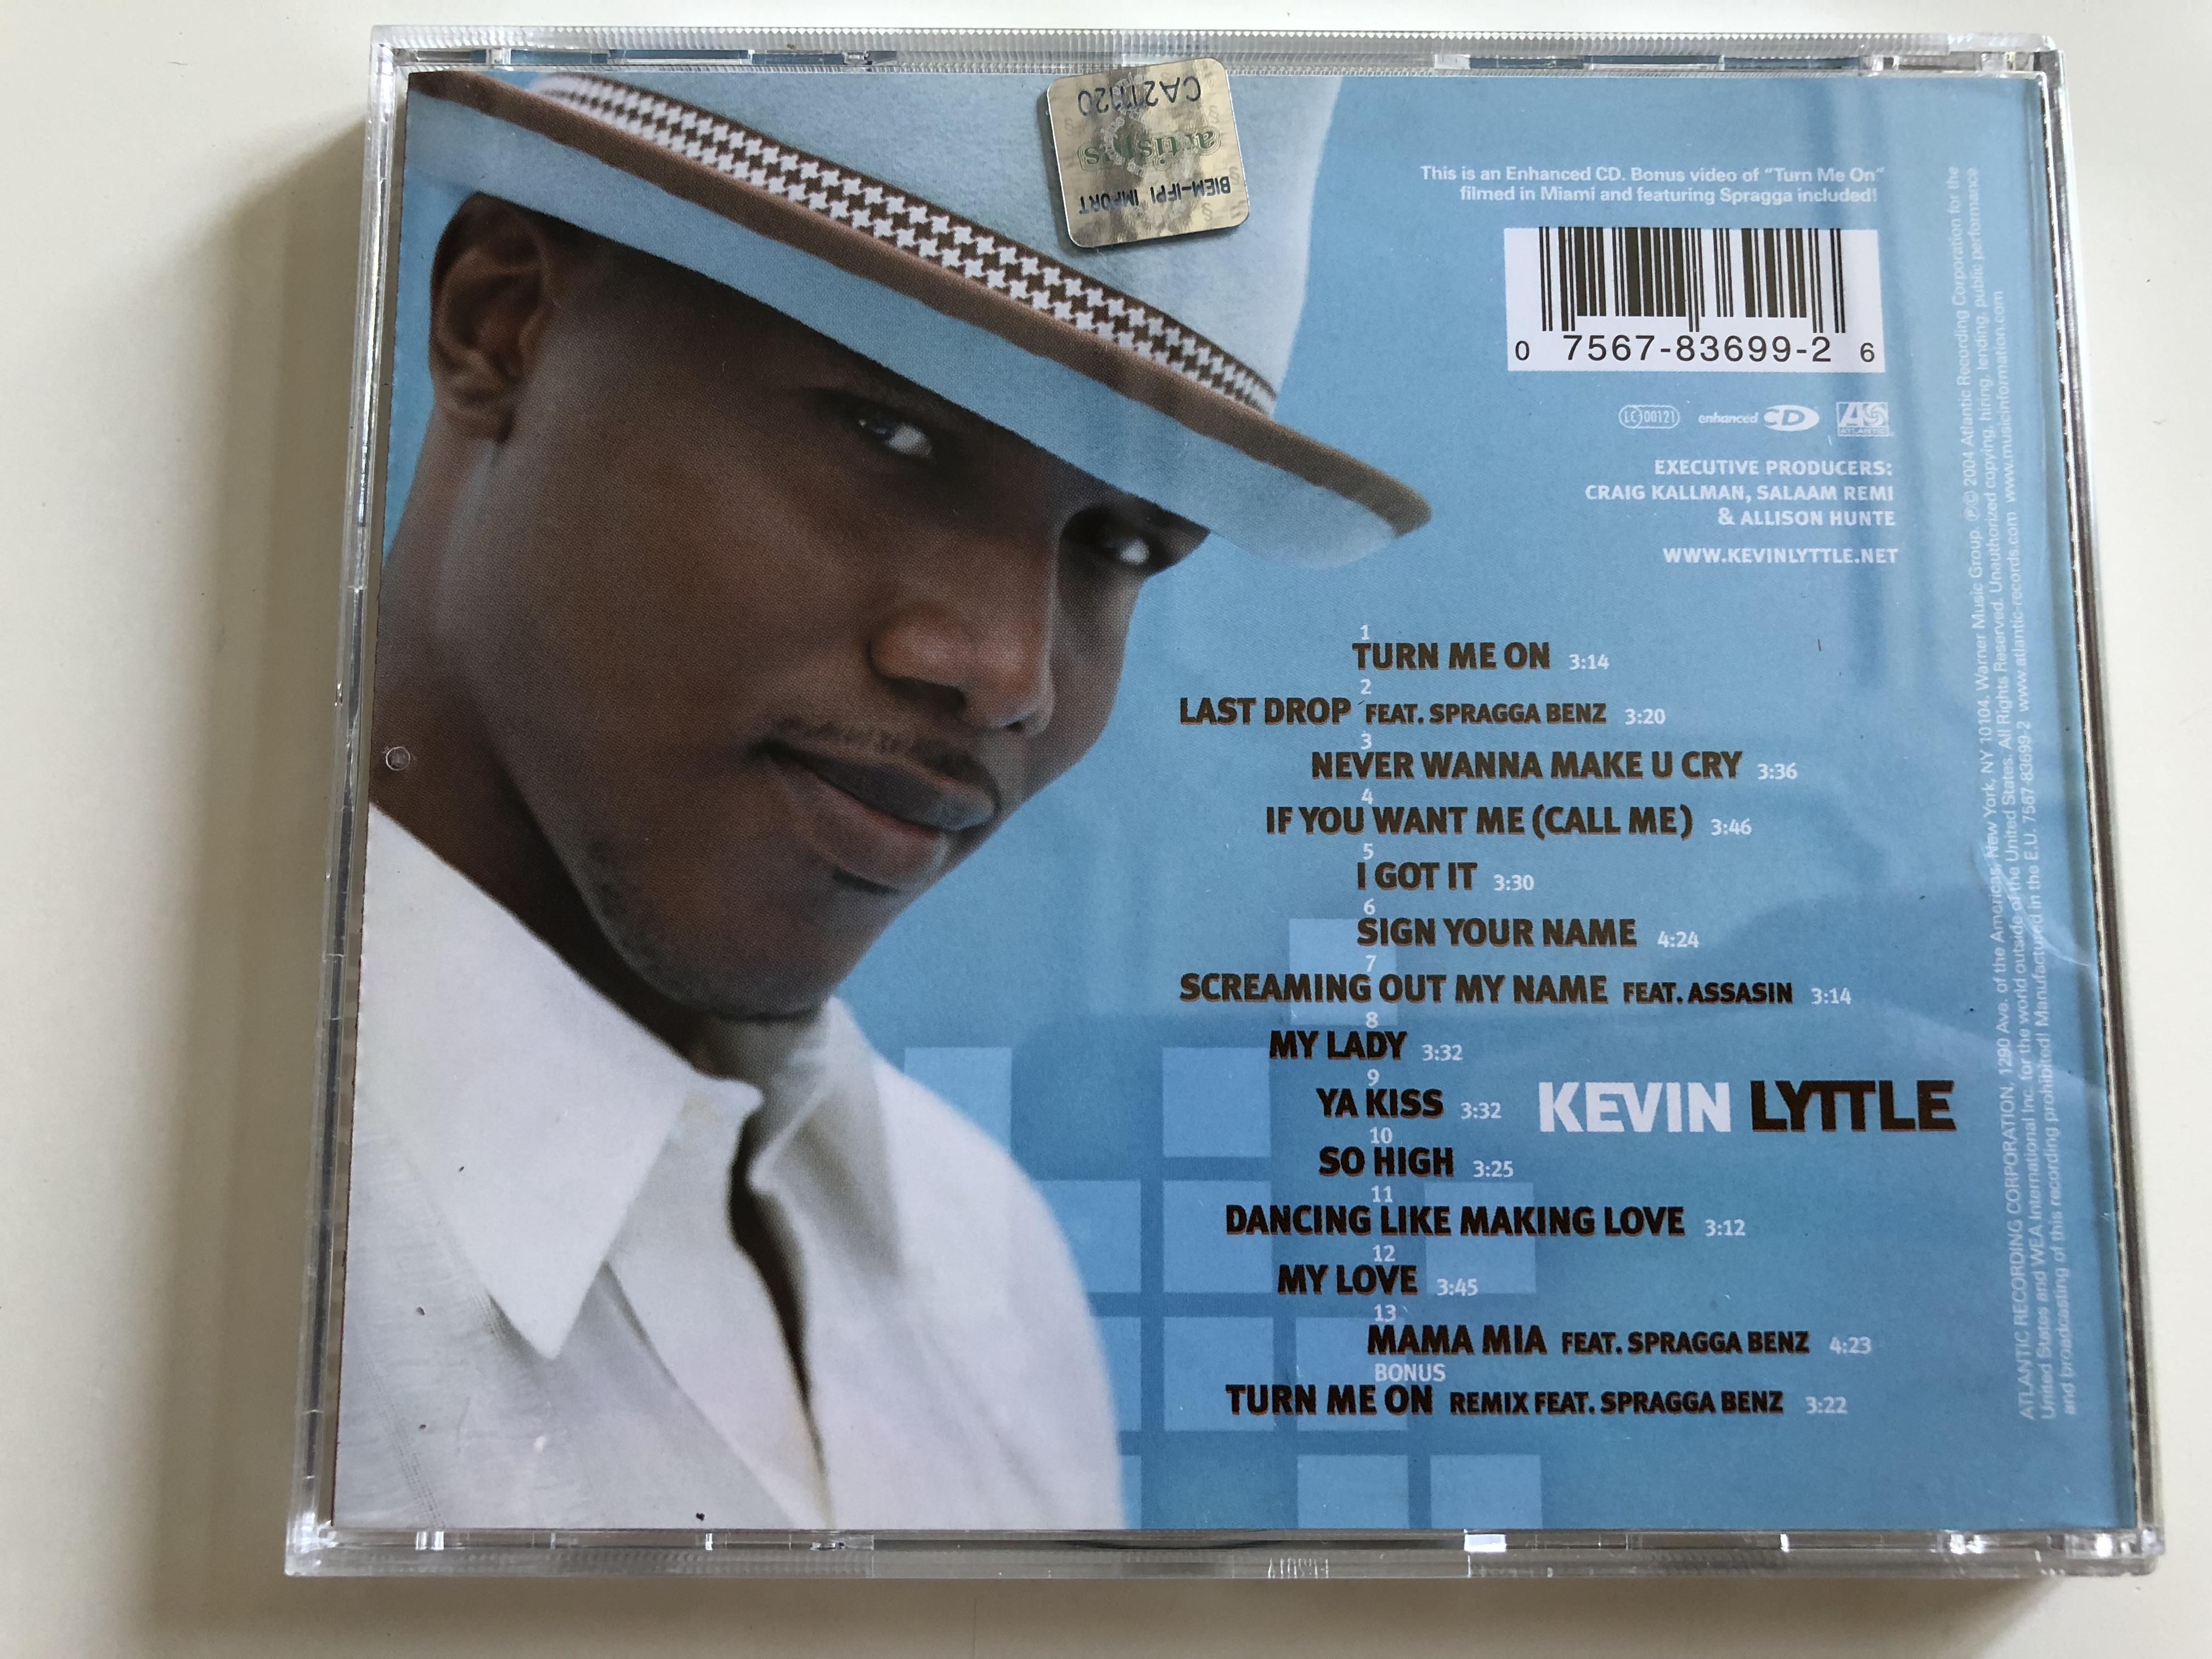 kevin-lyttle-enhanced-cd-with-bonus-video-audio-cd-2004-3-.jpg